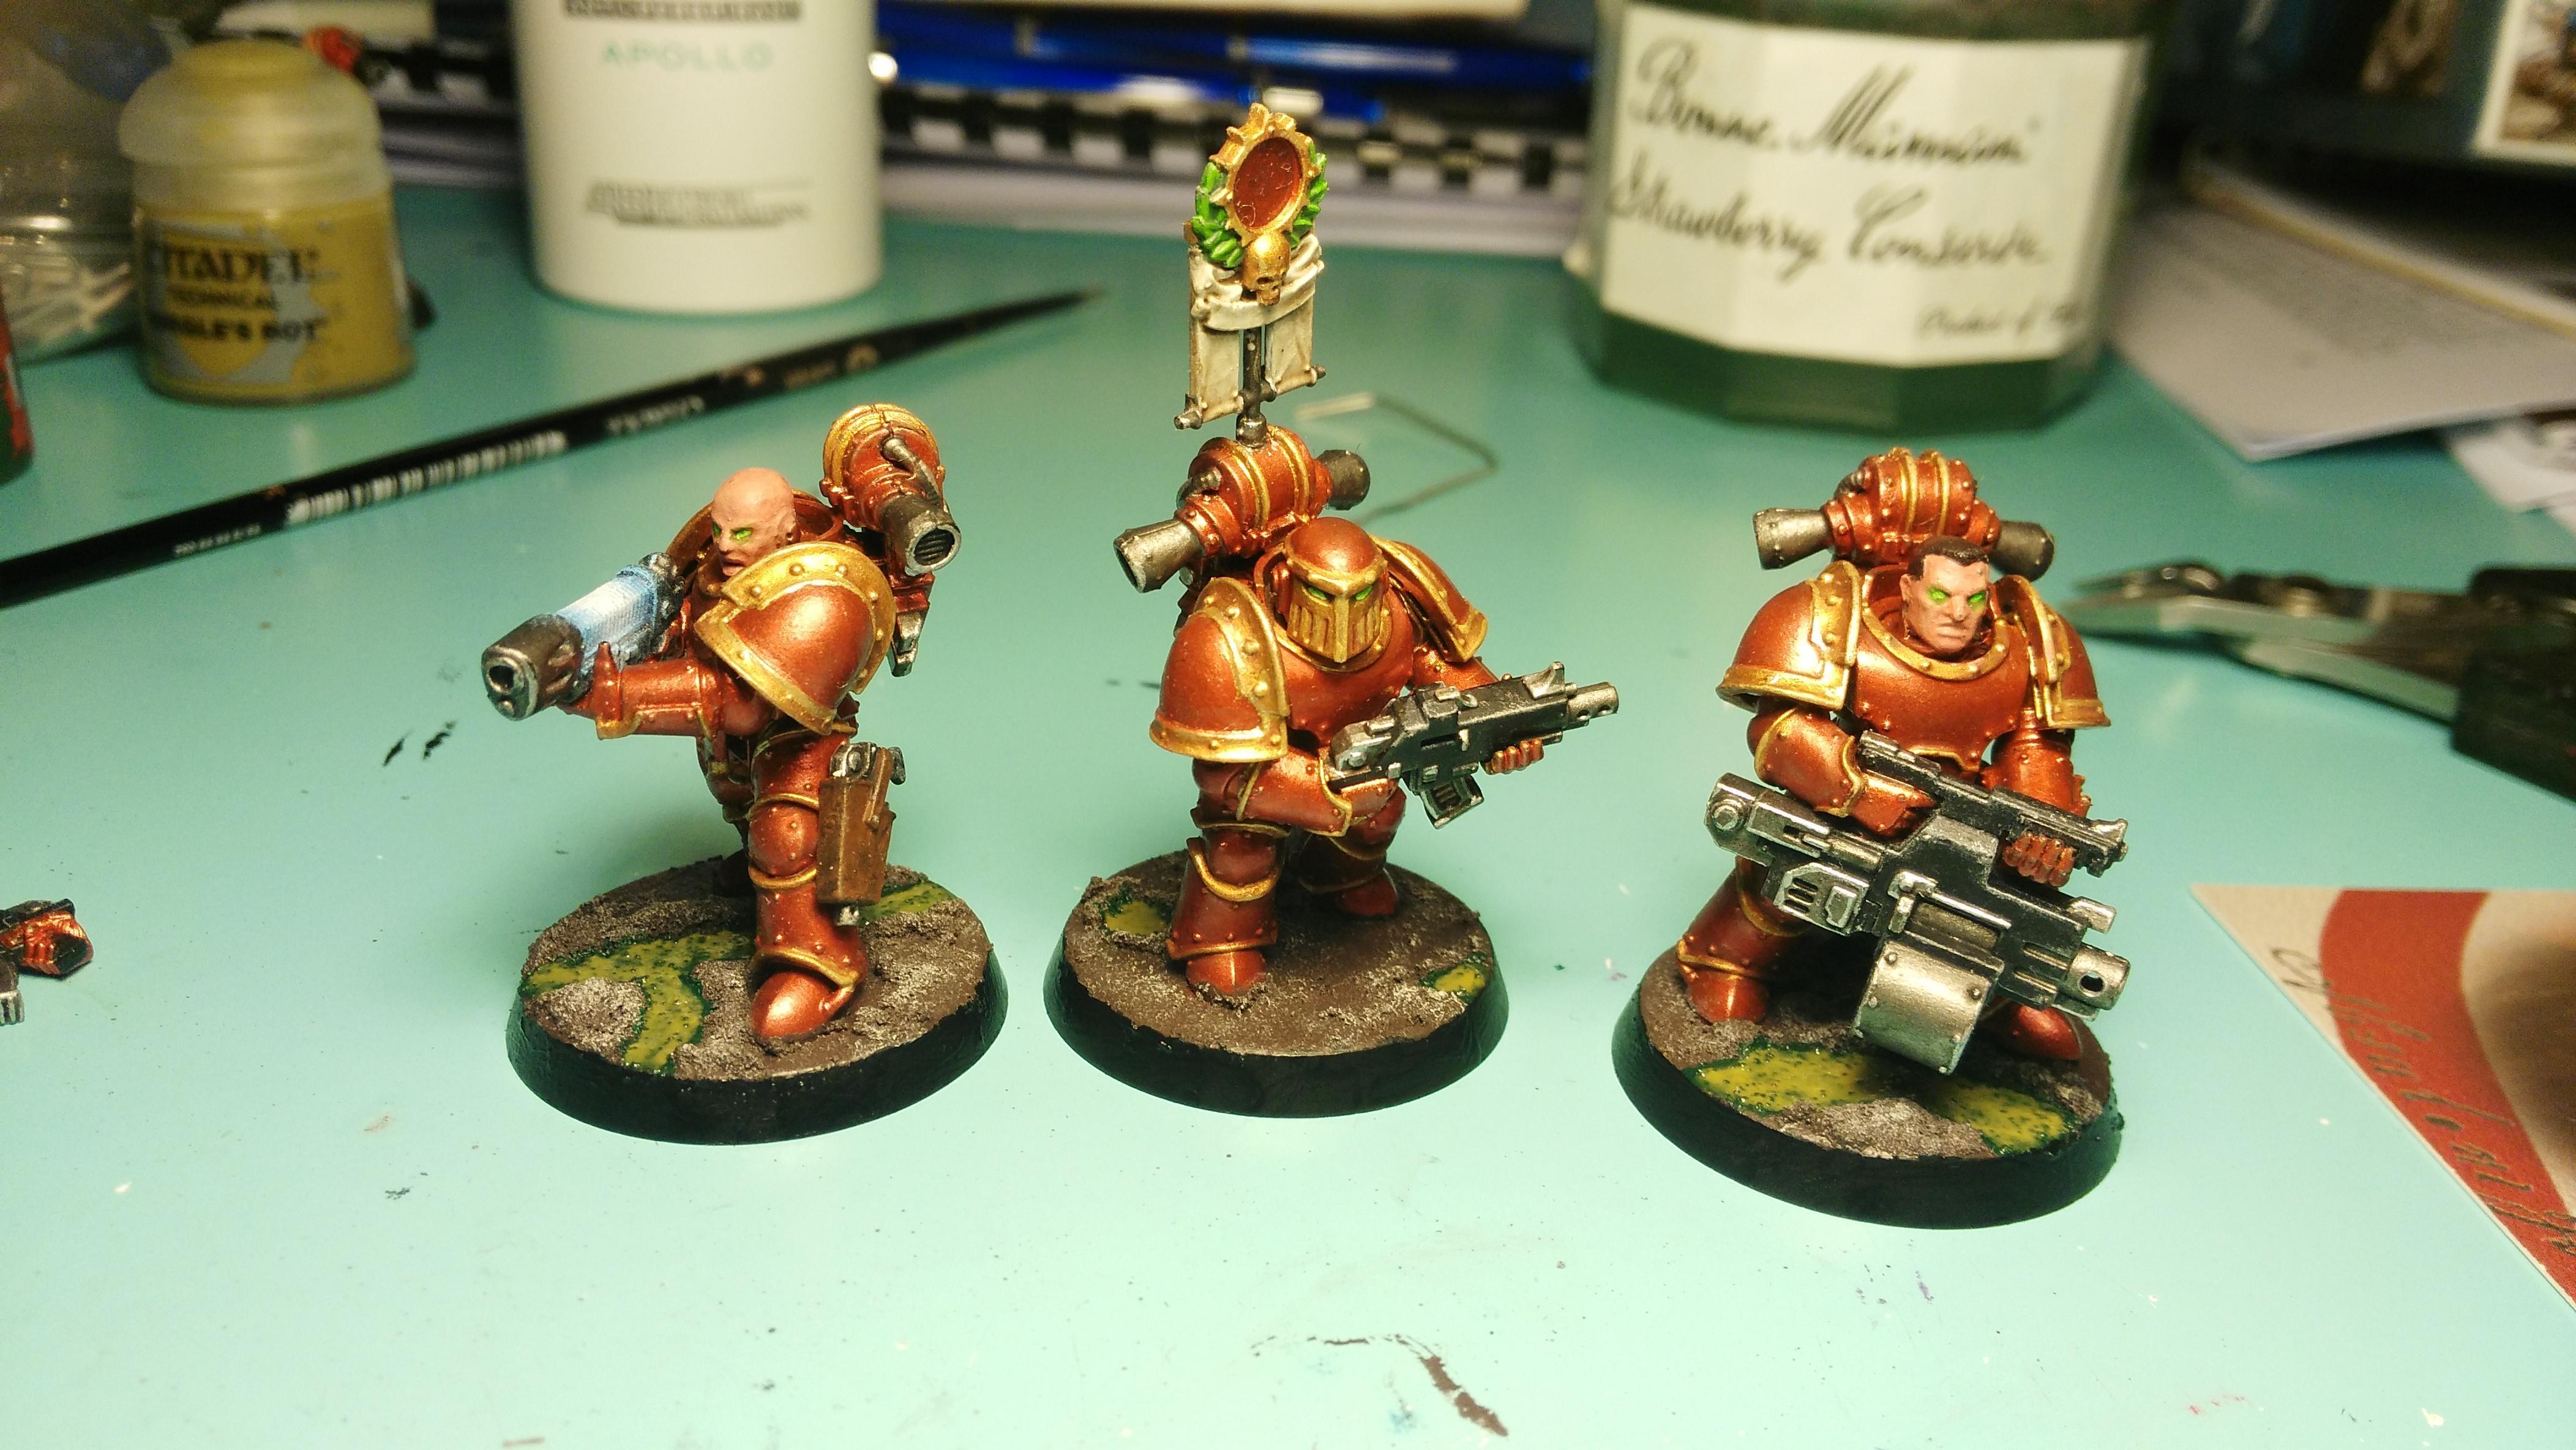 Burning Of Prospero, Chaos Space Marines, Horus Heresy, Thousand Sons, Traitor Legion